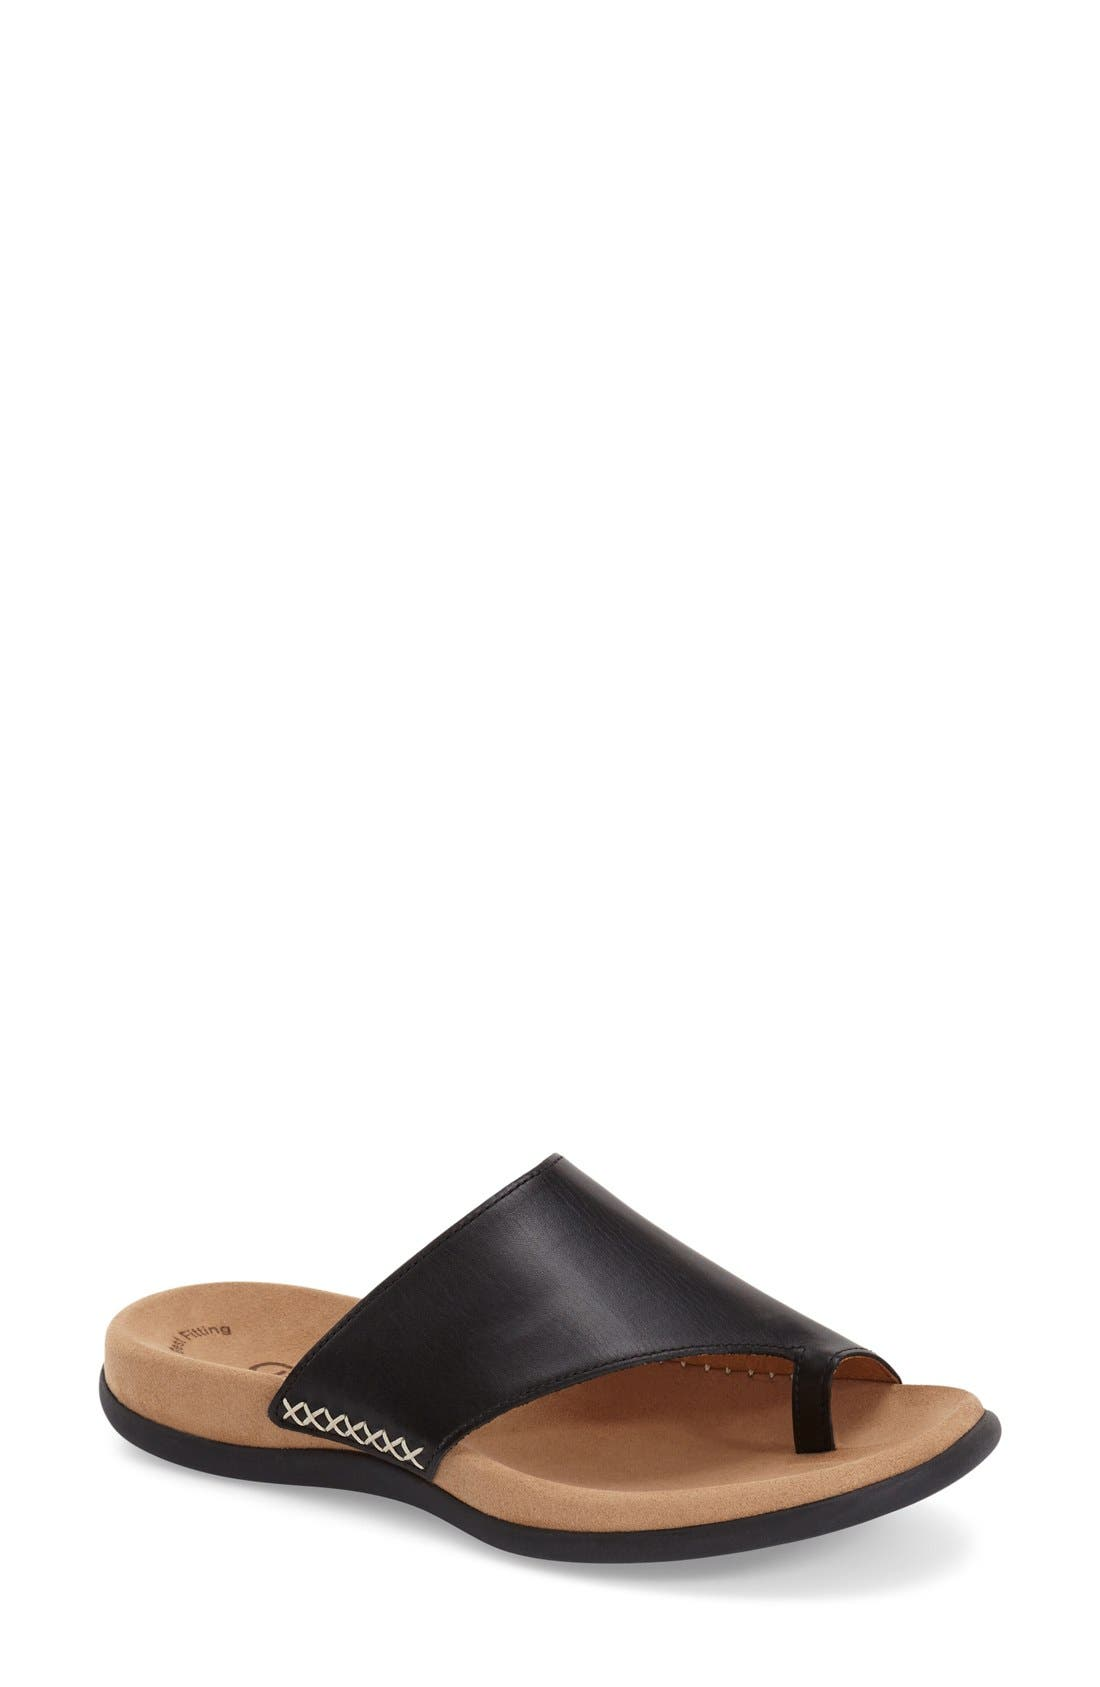 Toe Loop Sandal,                             Main thumbnail 1, color,                             BLACK NUBUCK LEATHER